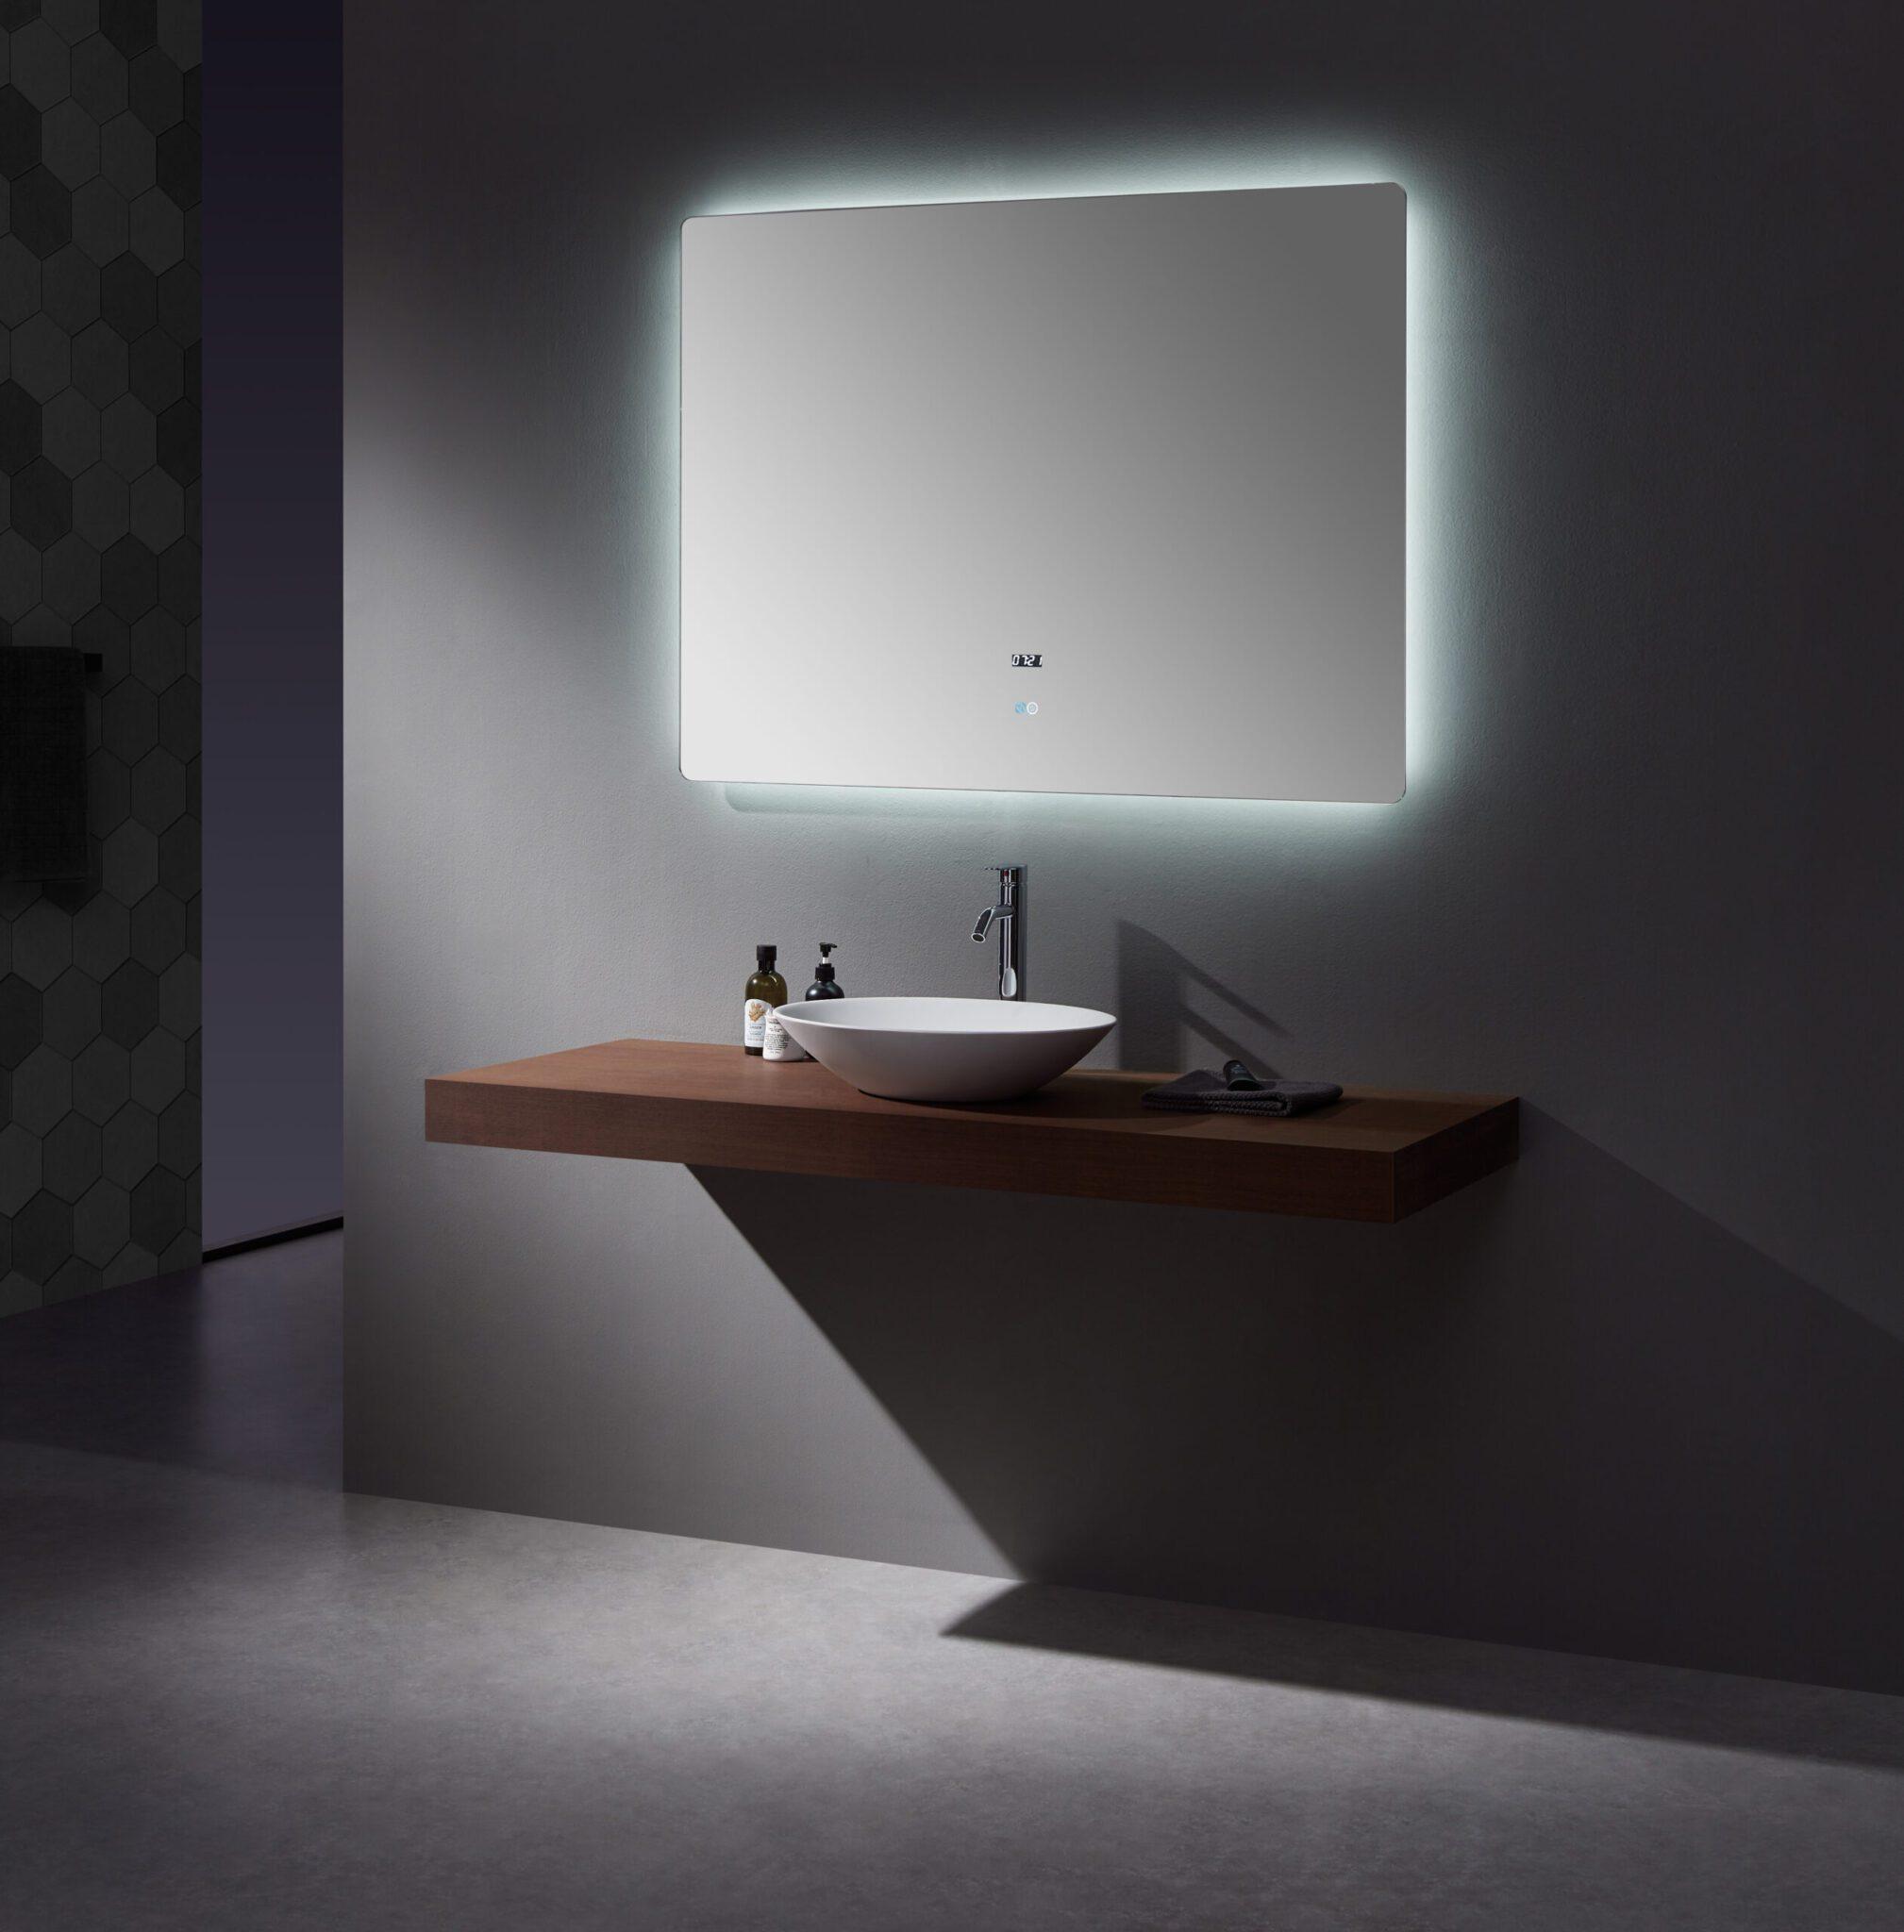 Lugano 48 Wide X 36 Tall Led Mirror W Defogger Lexora